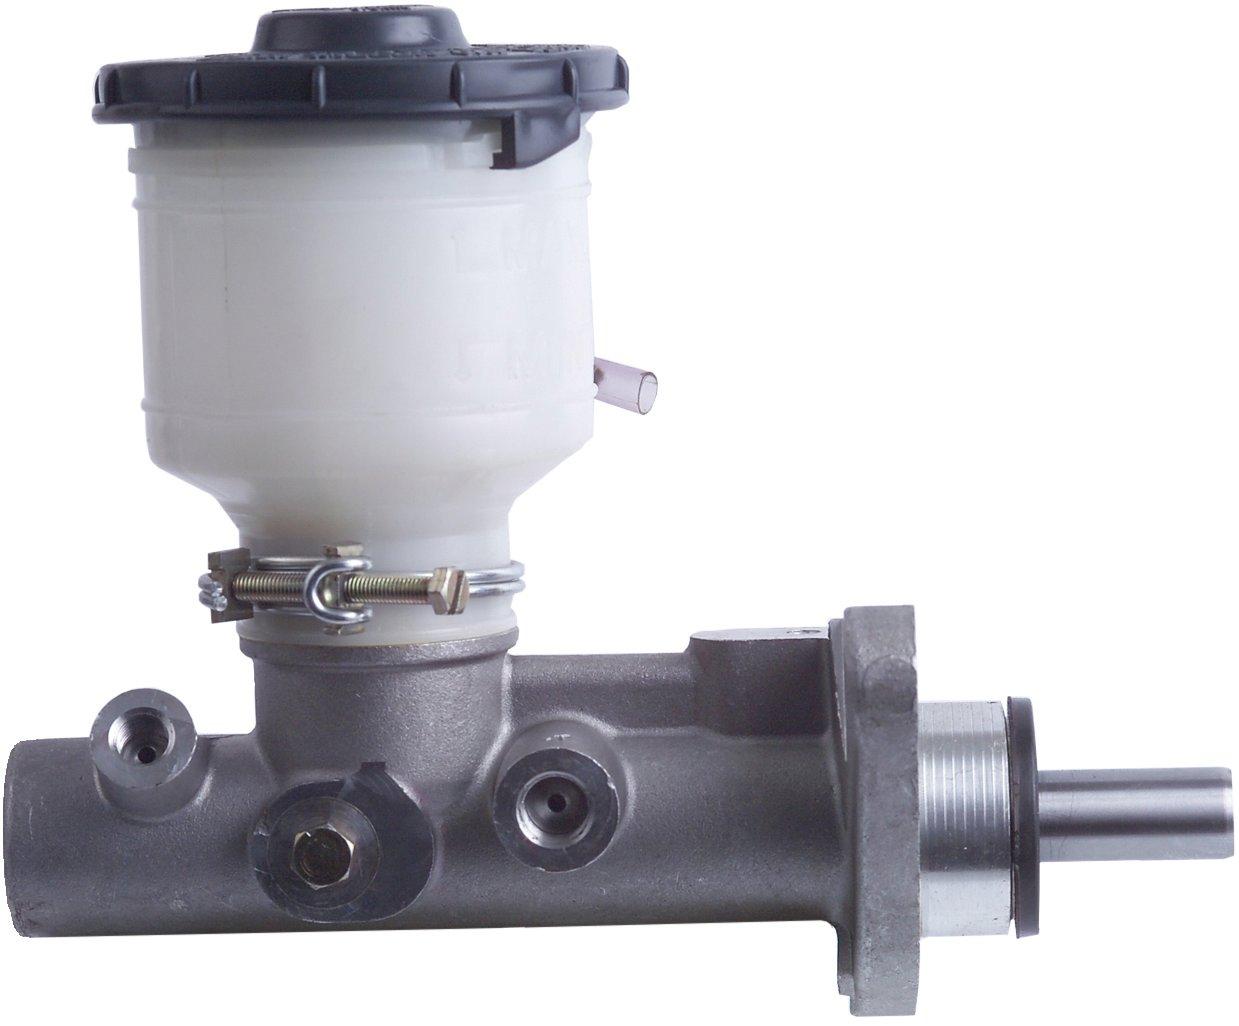 1.3mm MIPC9014 MIP Thorp Speed Tip Hex Driver